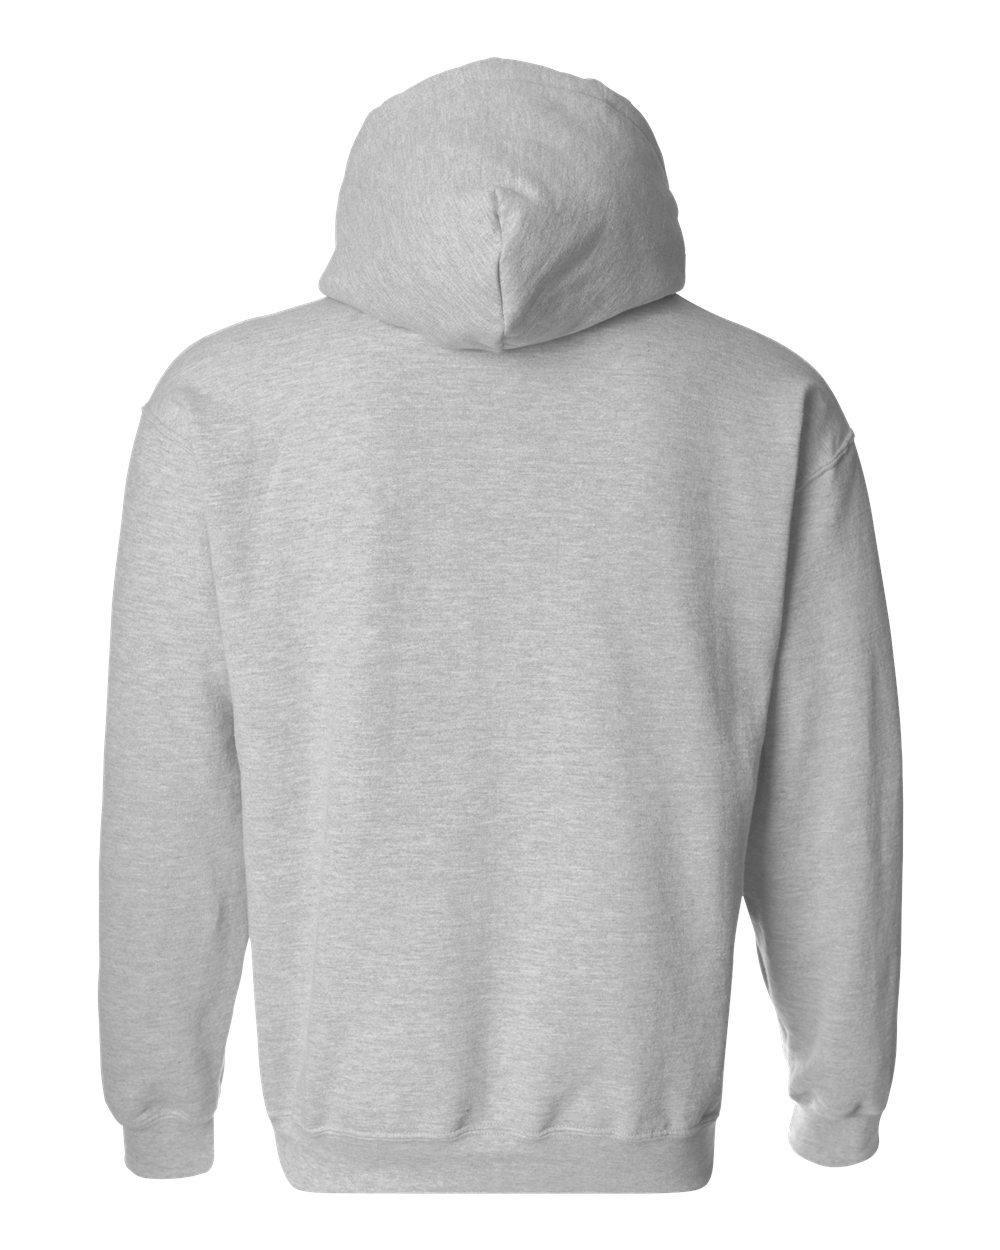 Gildan-Mens-Blank-Hoodie-Heavy-Blend-Hooded-Sweatshirt-Solid-18500-up-to-5XL thumbnail 96